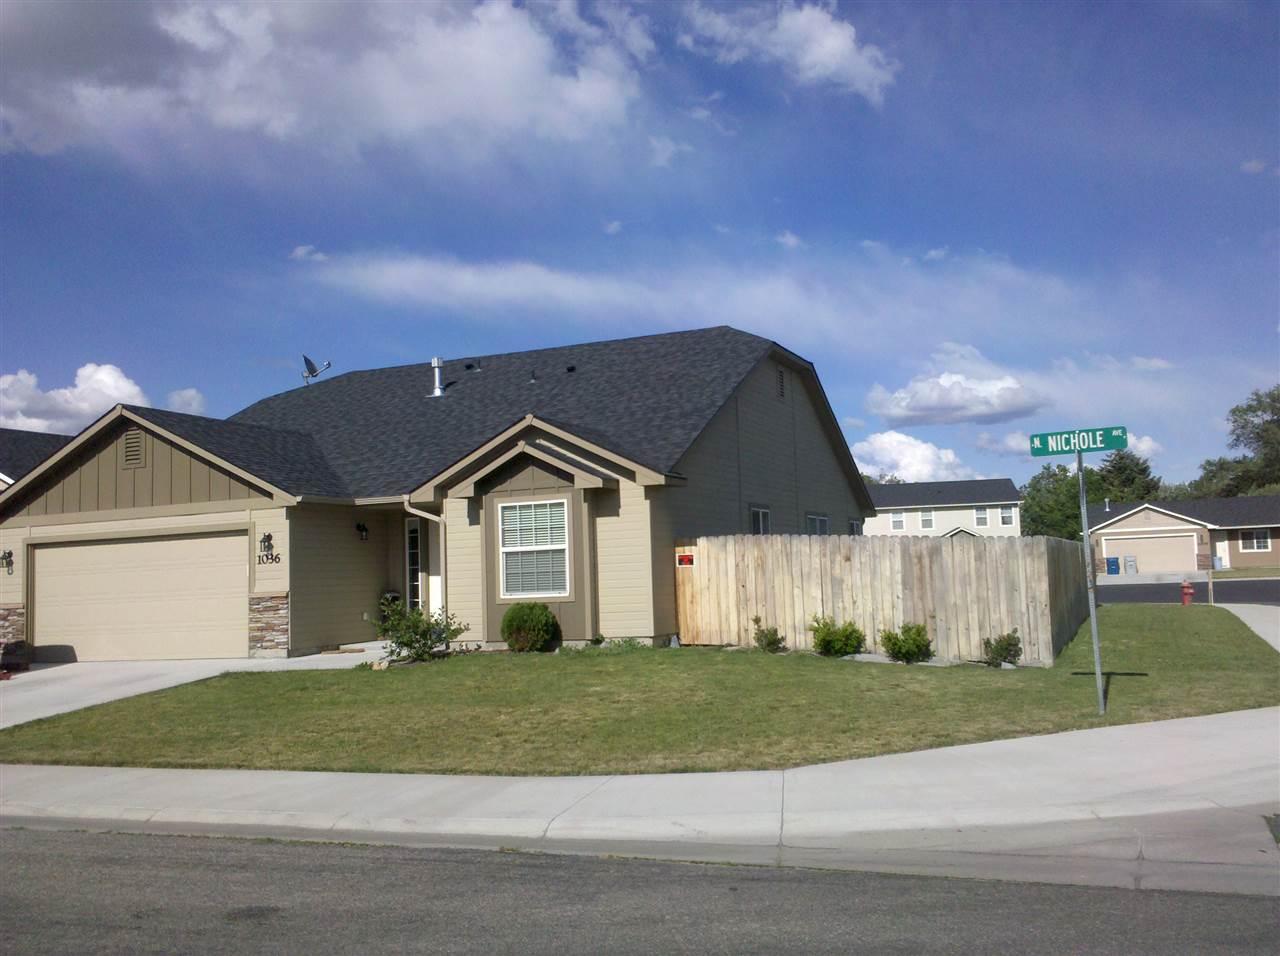 11541 Silvercity Ct, Boise, ID 83713